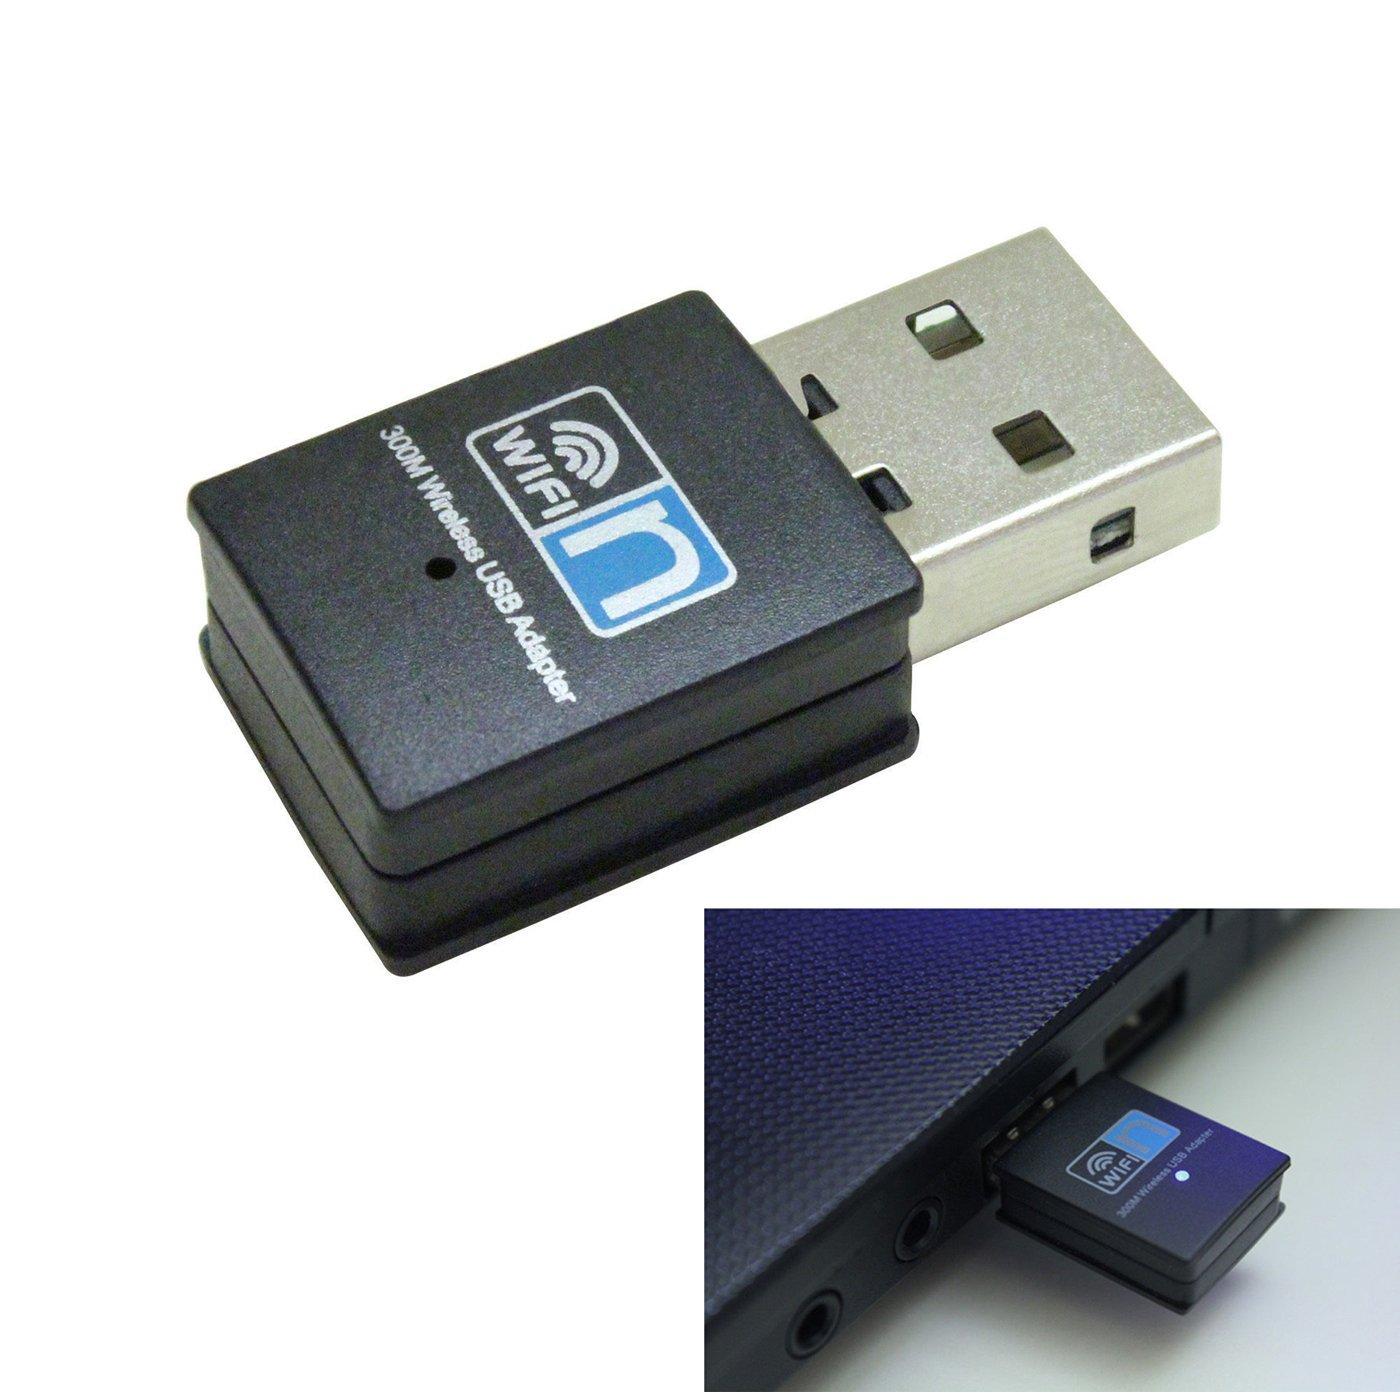 NewBull- 300Mbps Mini USB Wireless WiFi Adapter 802.11n/g/b LAN Internet Network Adapter Receiver